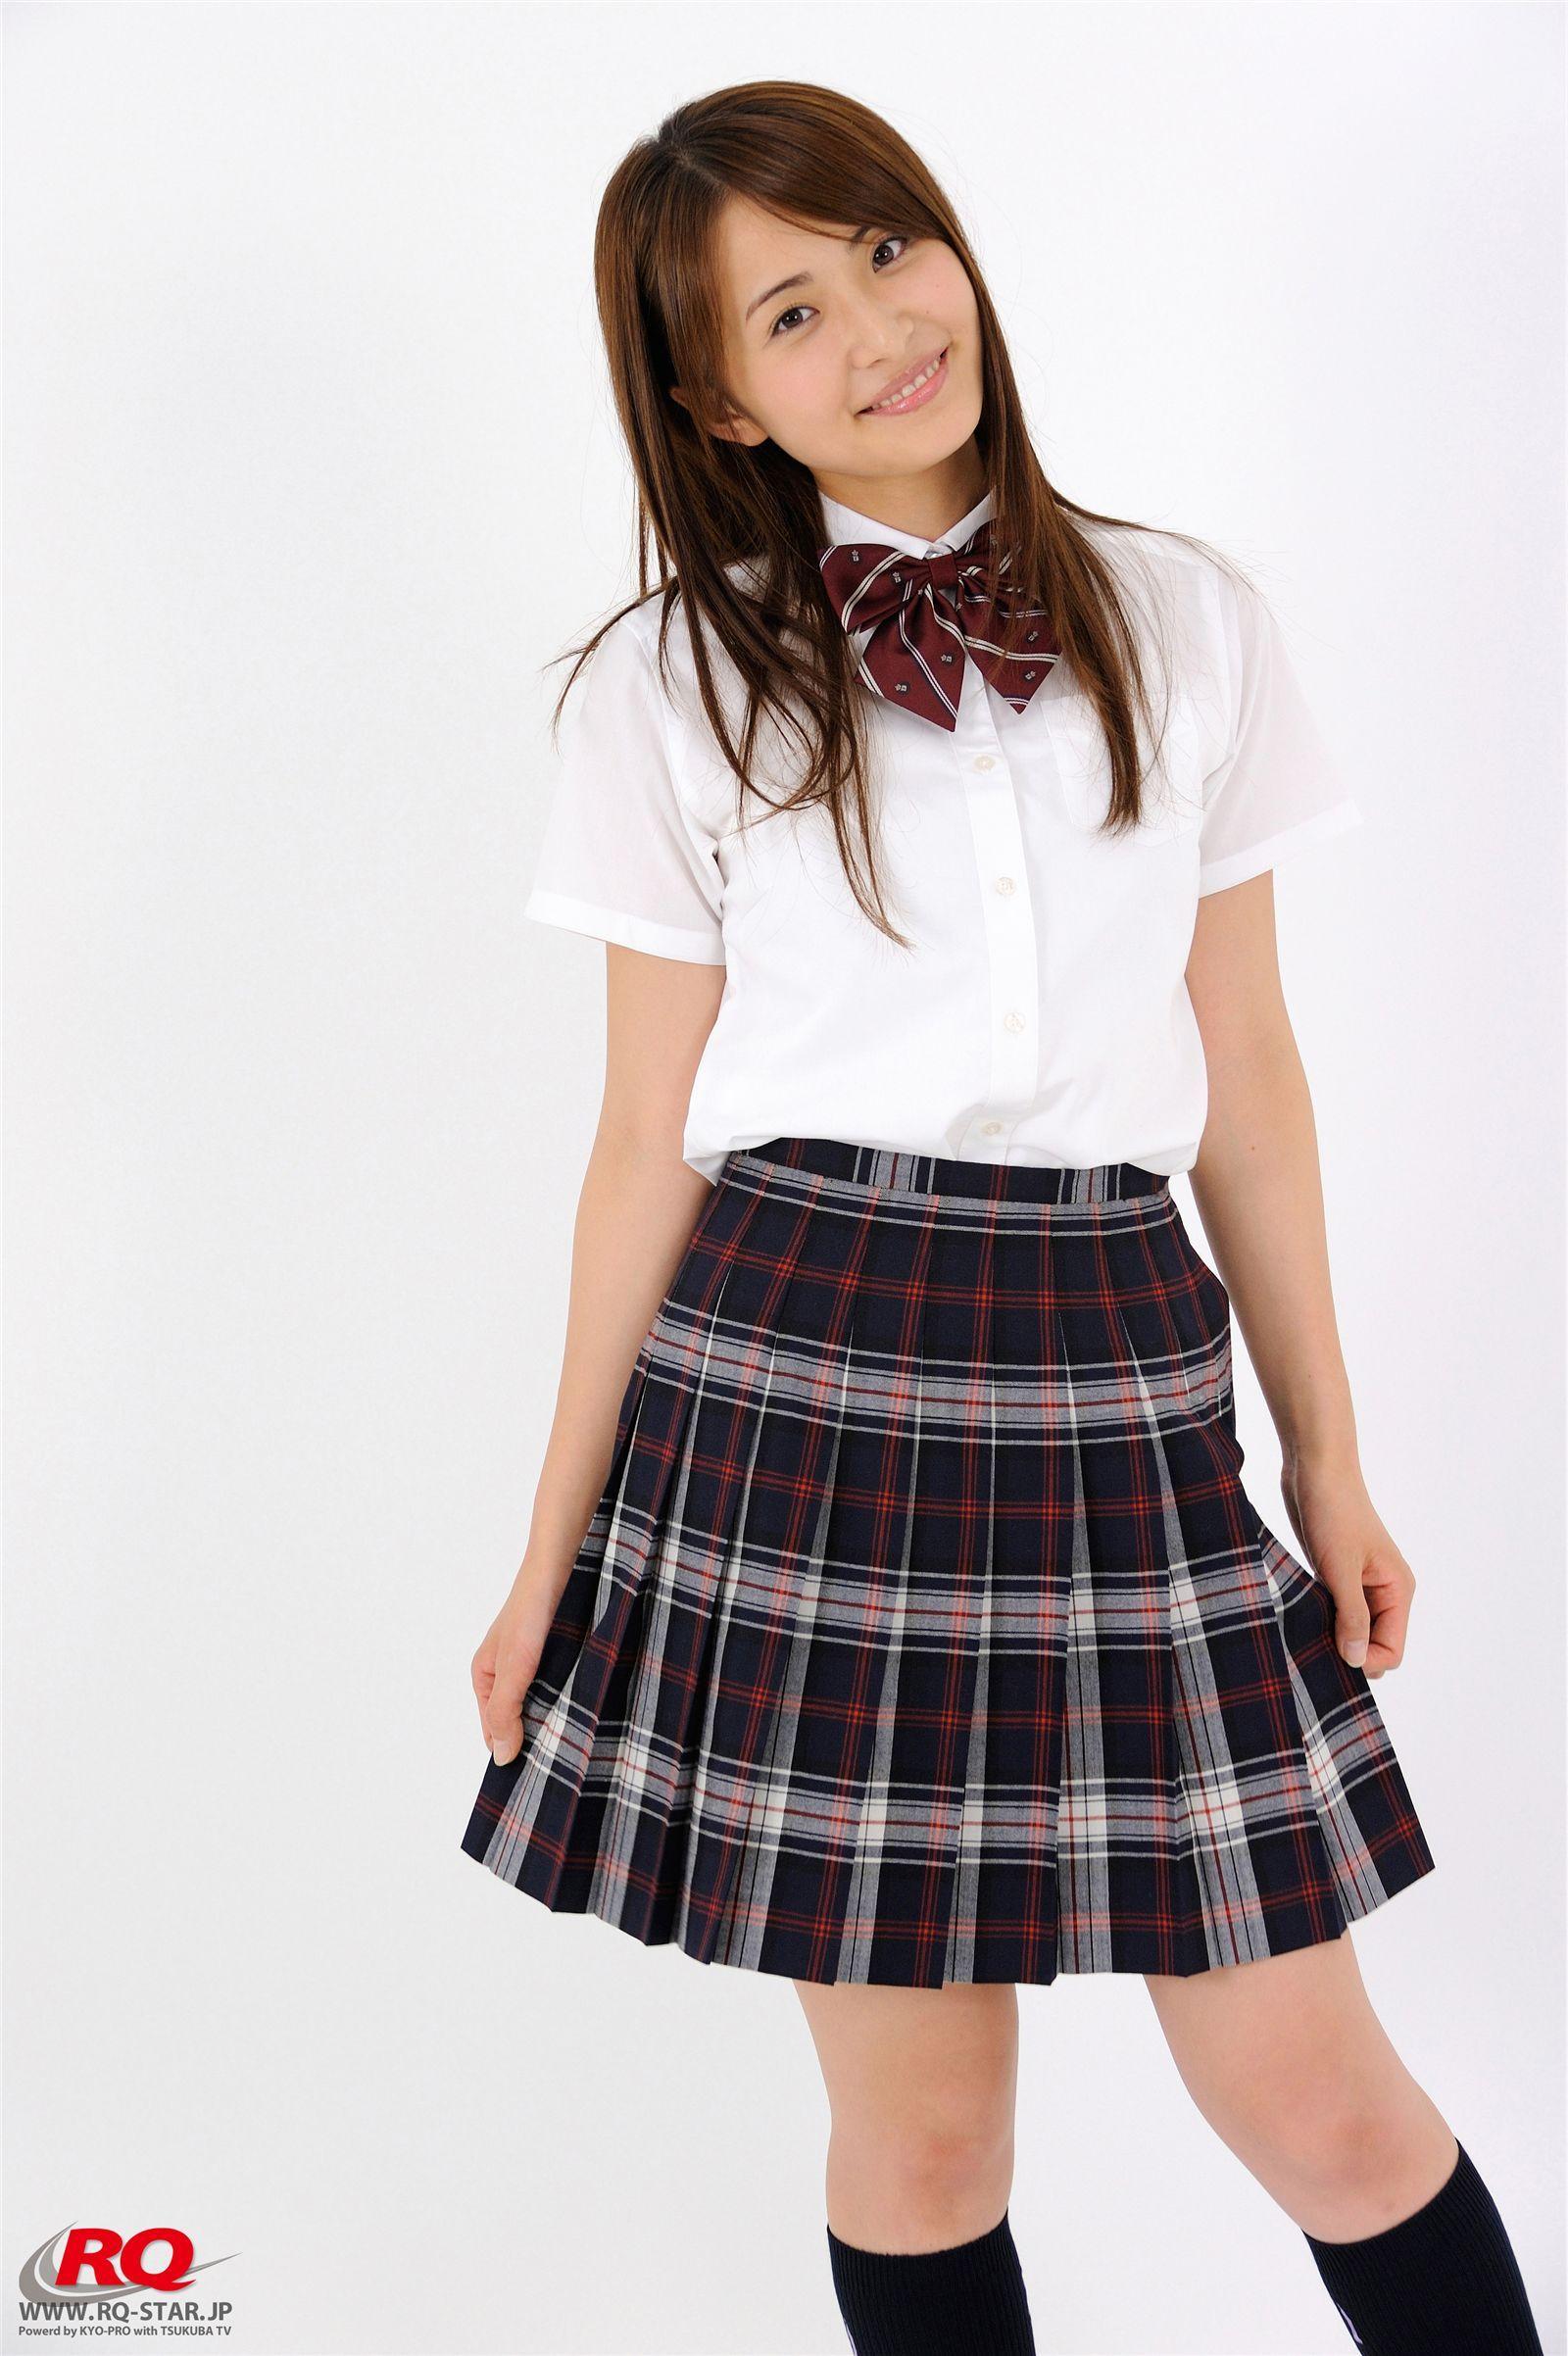 [RQ STAR美女] NO.01148 Rena Sawai 澤井玲菜 Student Style[40P] RQ STAR 第2张